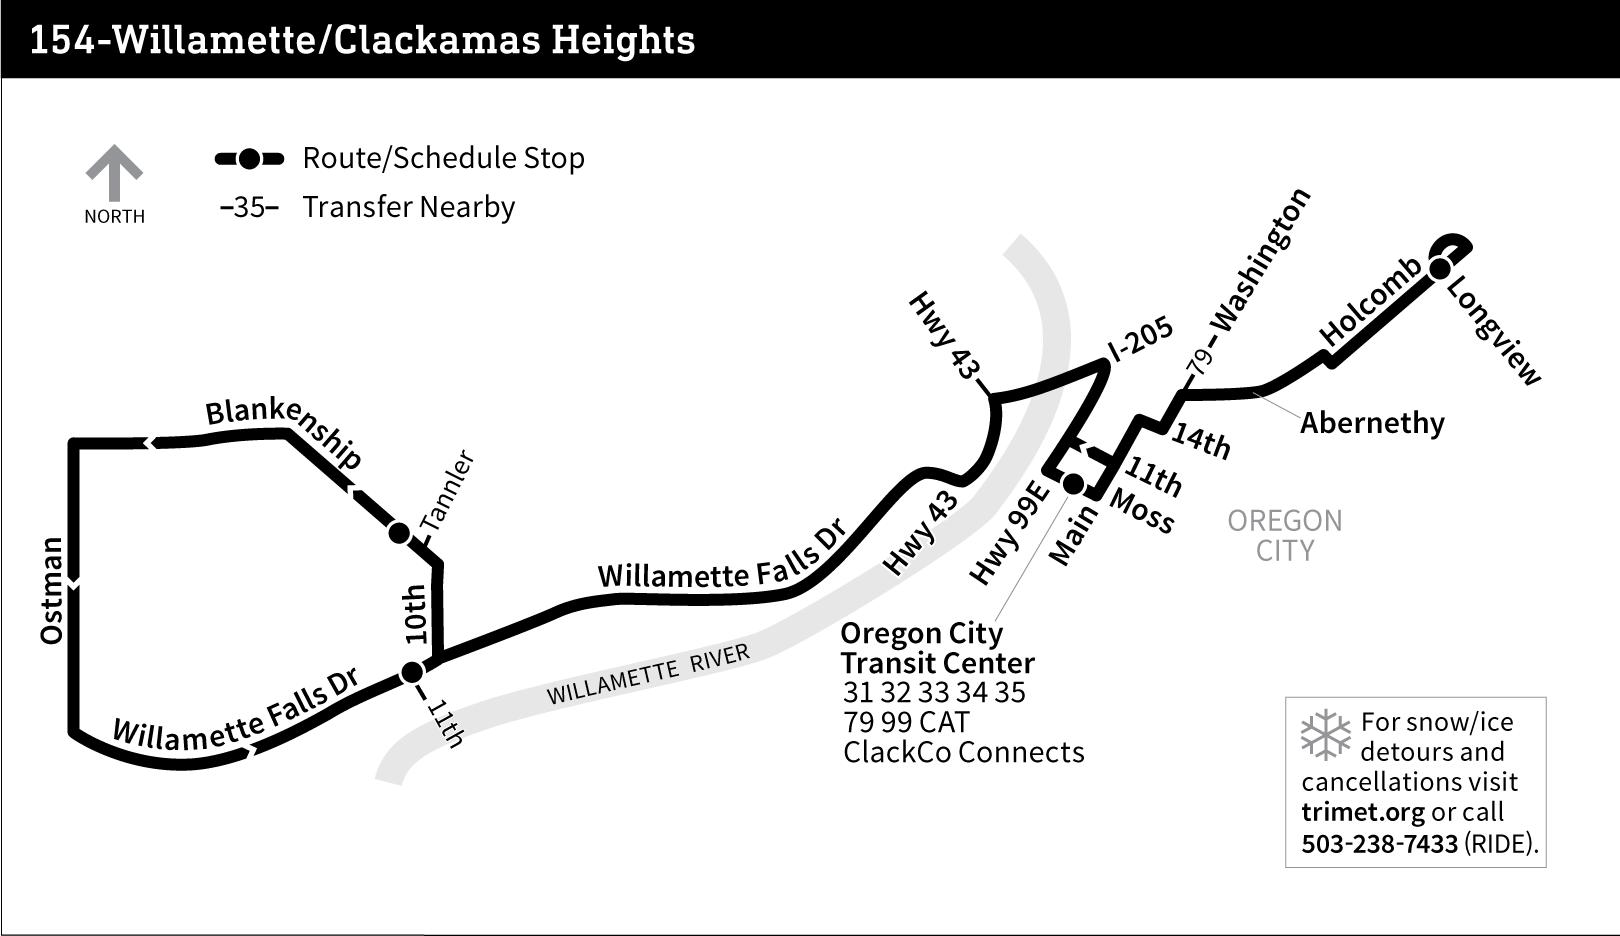 Line 154 Willamette Clackamas Heights